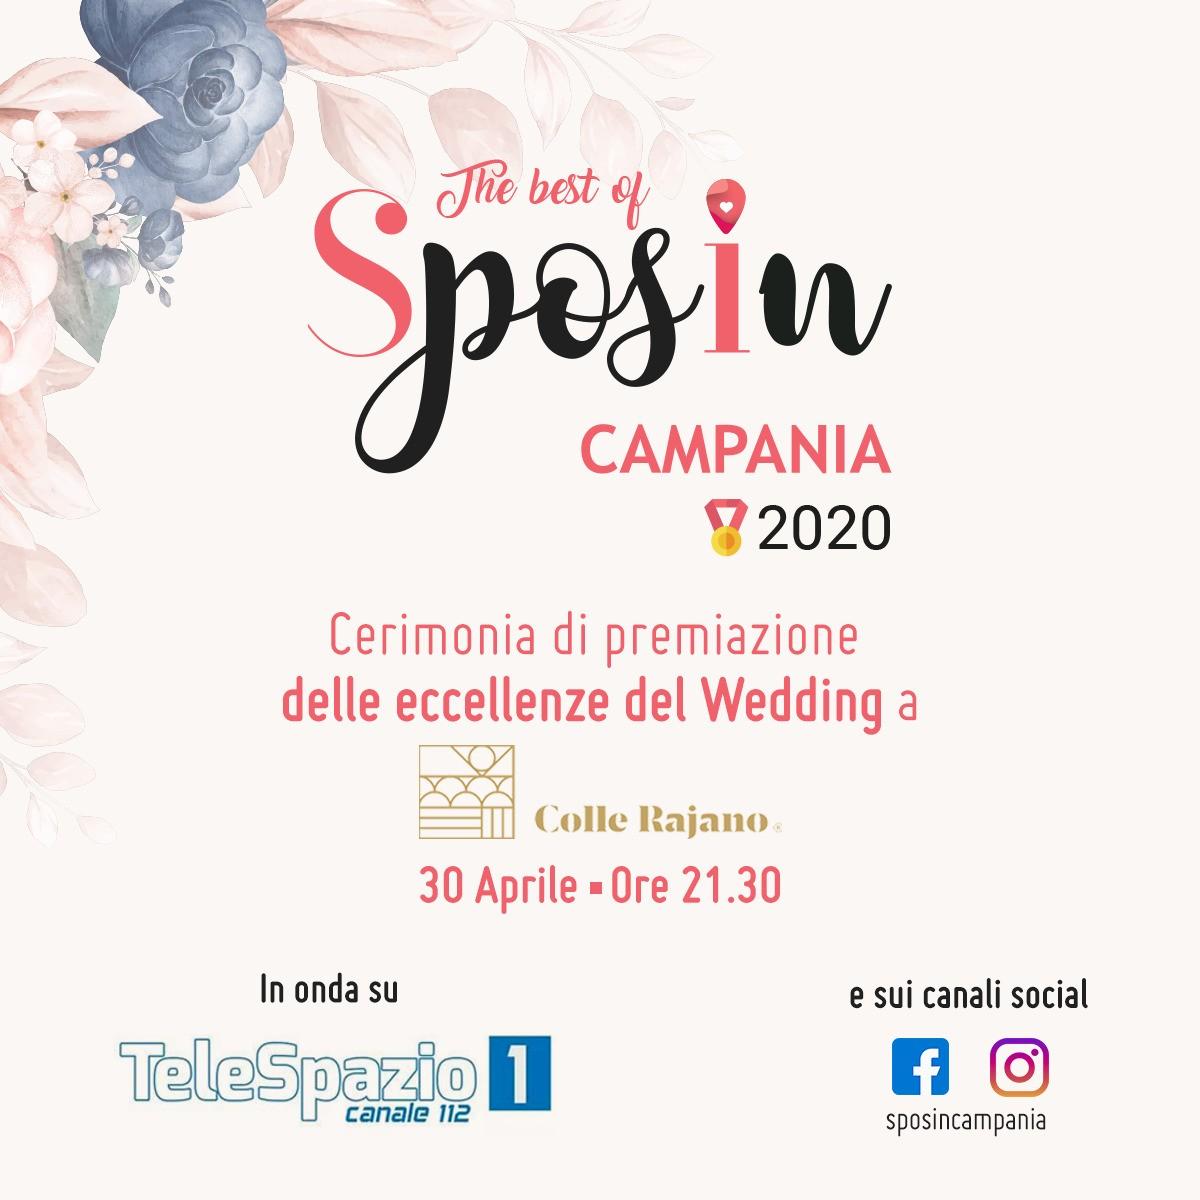 The Best of Sposincampania 2020, The Best of Sposincampania, SposIn Campania, Telespazio, Gianni Molaro, wedding campania, wedding, premi wedding campania, matrimoni campania, sposi campania, premiazione sposincampania, eventi campania